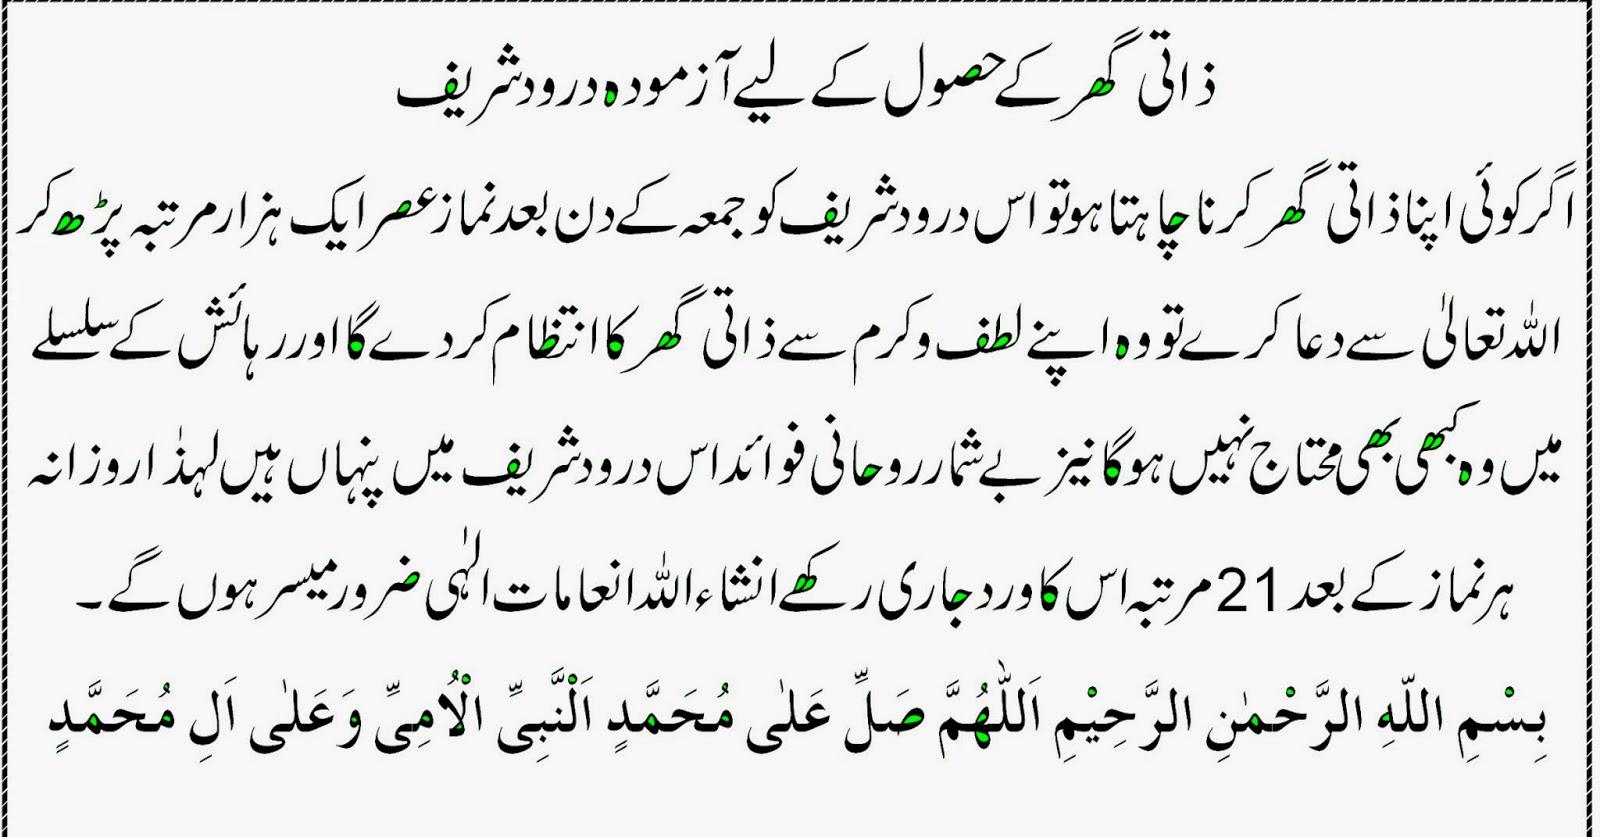 Zati Ghar K Husool K Liye Azmooda Durood Sharif